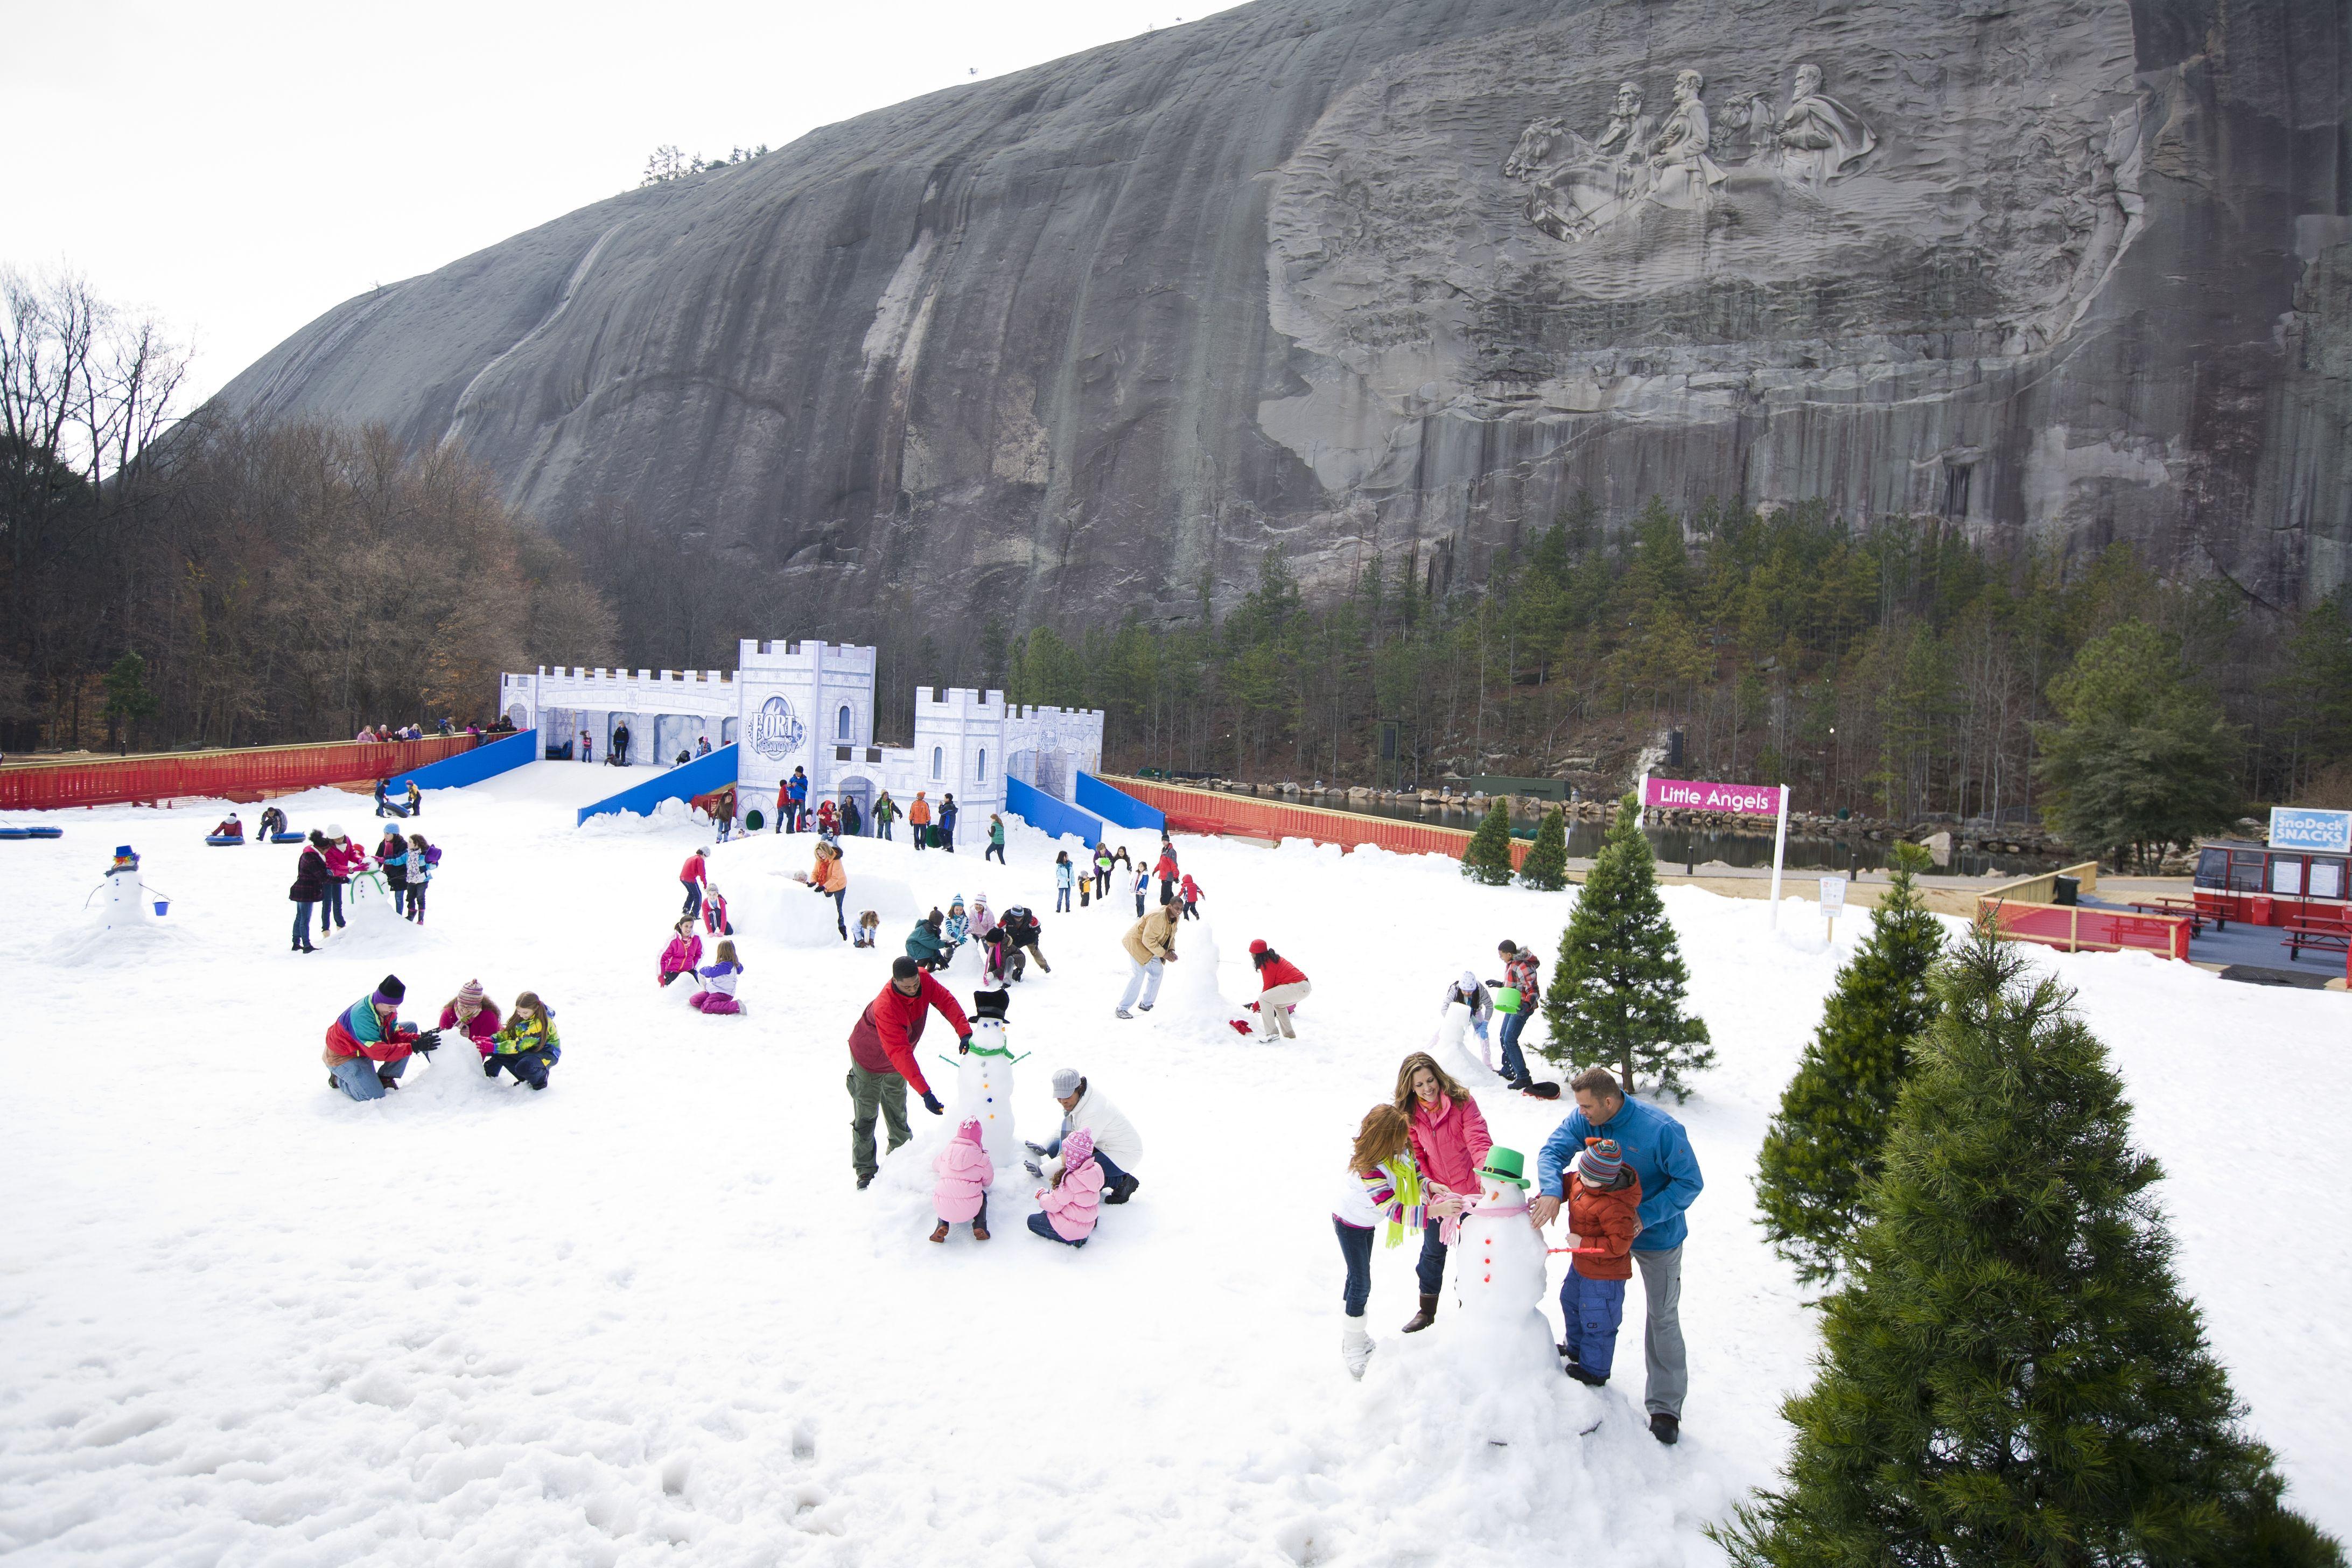 Snow in Atlanta? Absolutely! Visit Snow Mountain at Stone